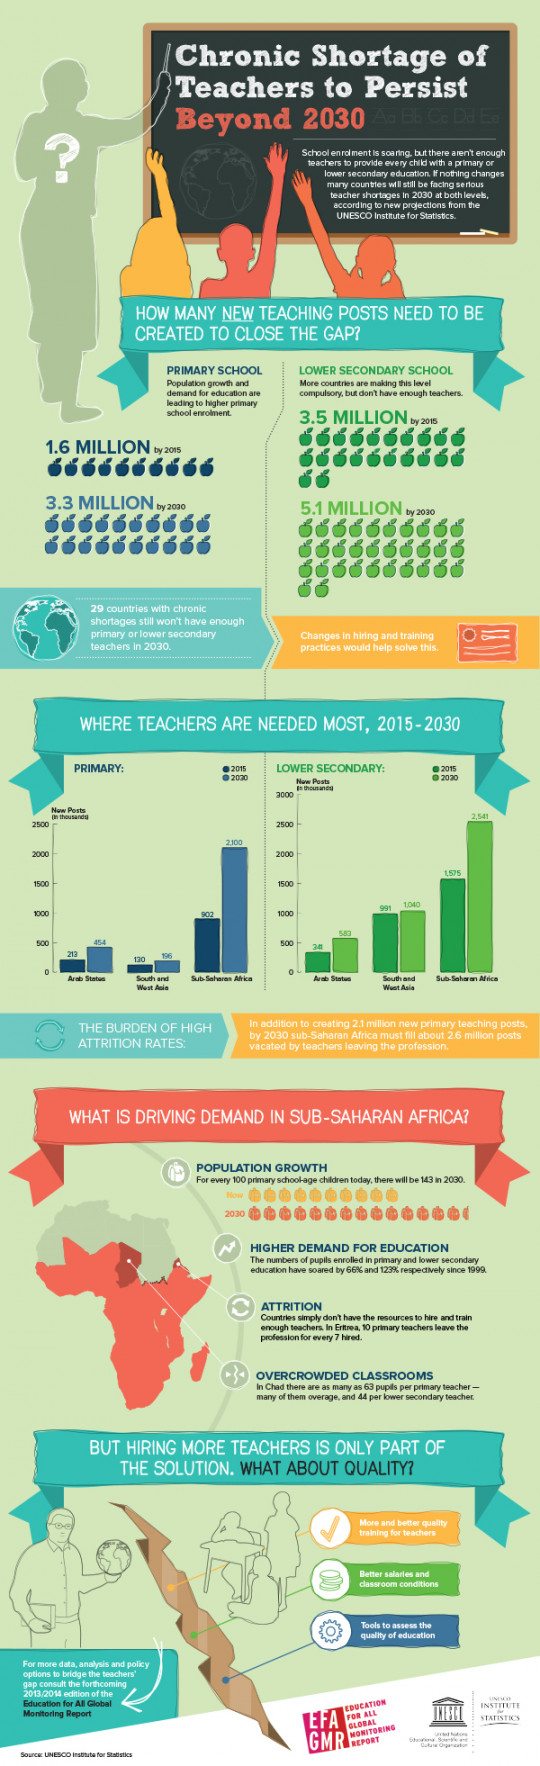 Chronic shortage of teachers